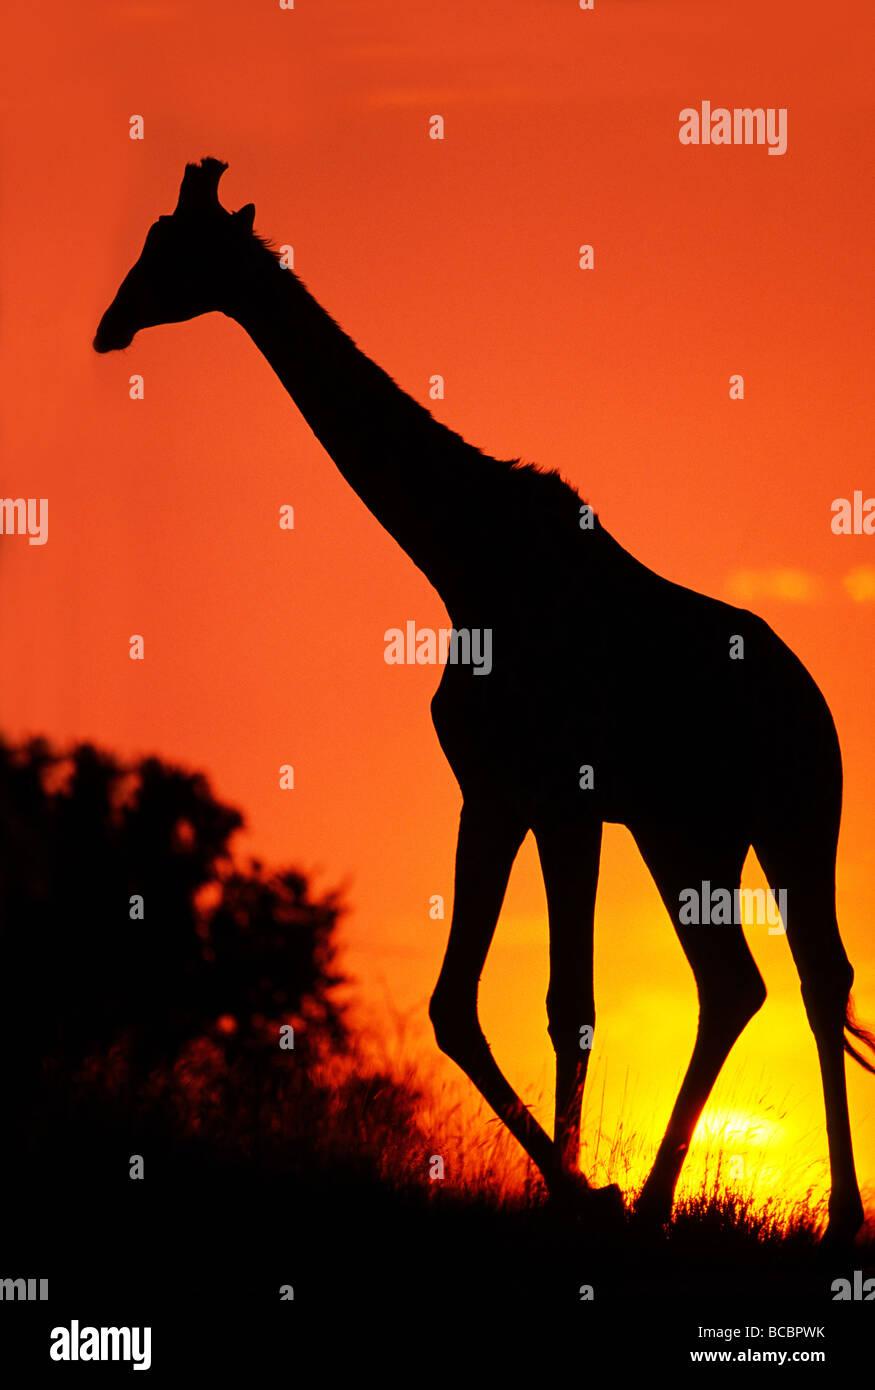 AFRICAN GIRAFFE AT SUNSET - Stock Image